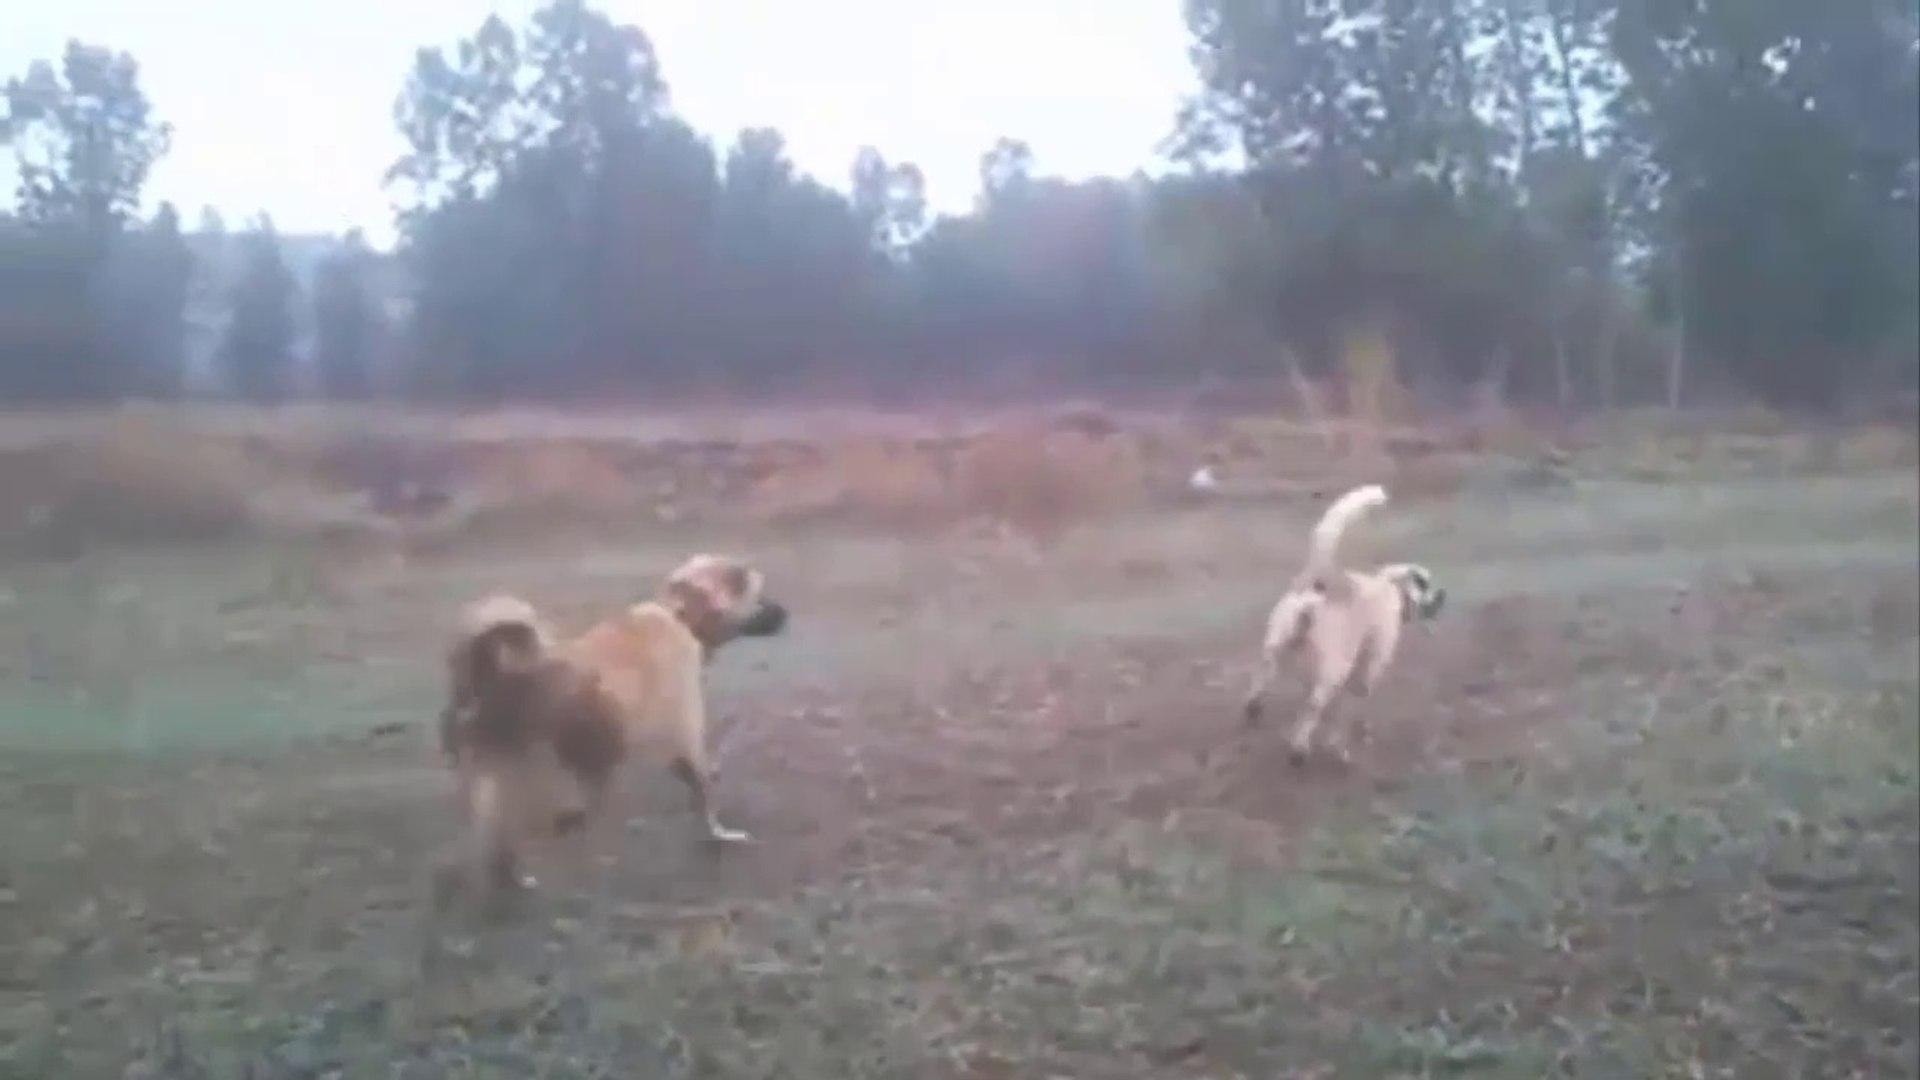 SiVAS KANGAL KOPEKLERi KURT DEVRiYESi - KANGAL SHEPHERD DOGS WOLF WATCH